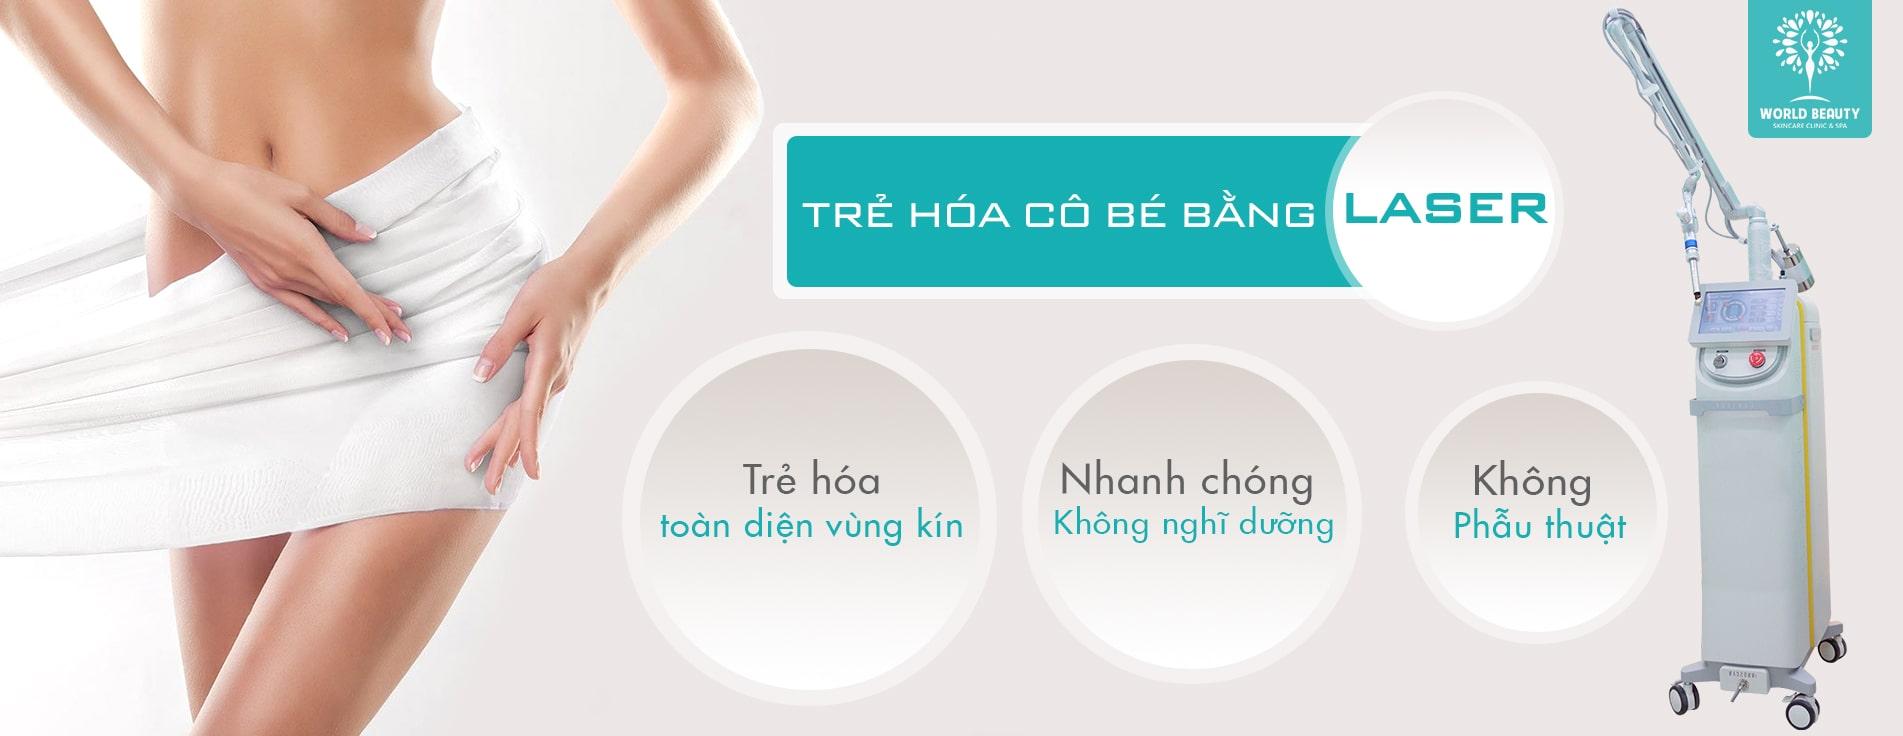 Trẻ hóa vùng kín bằng Laser - World Beauty Clinic